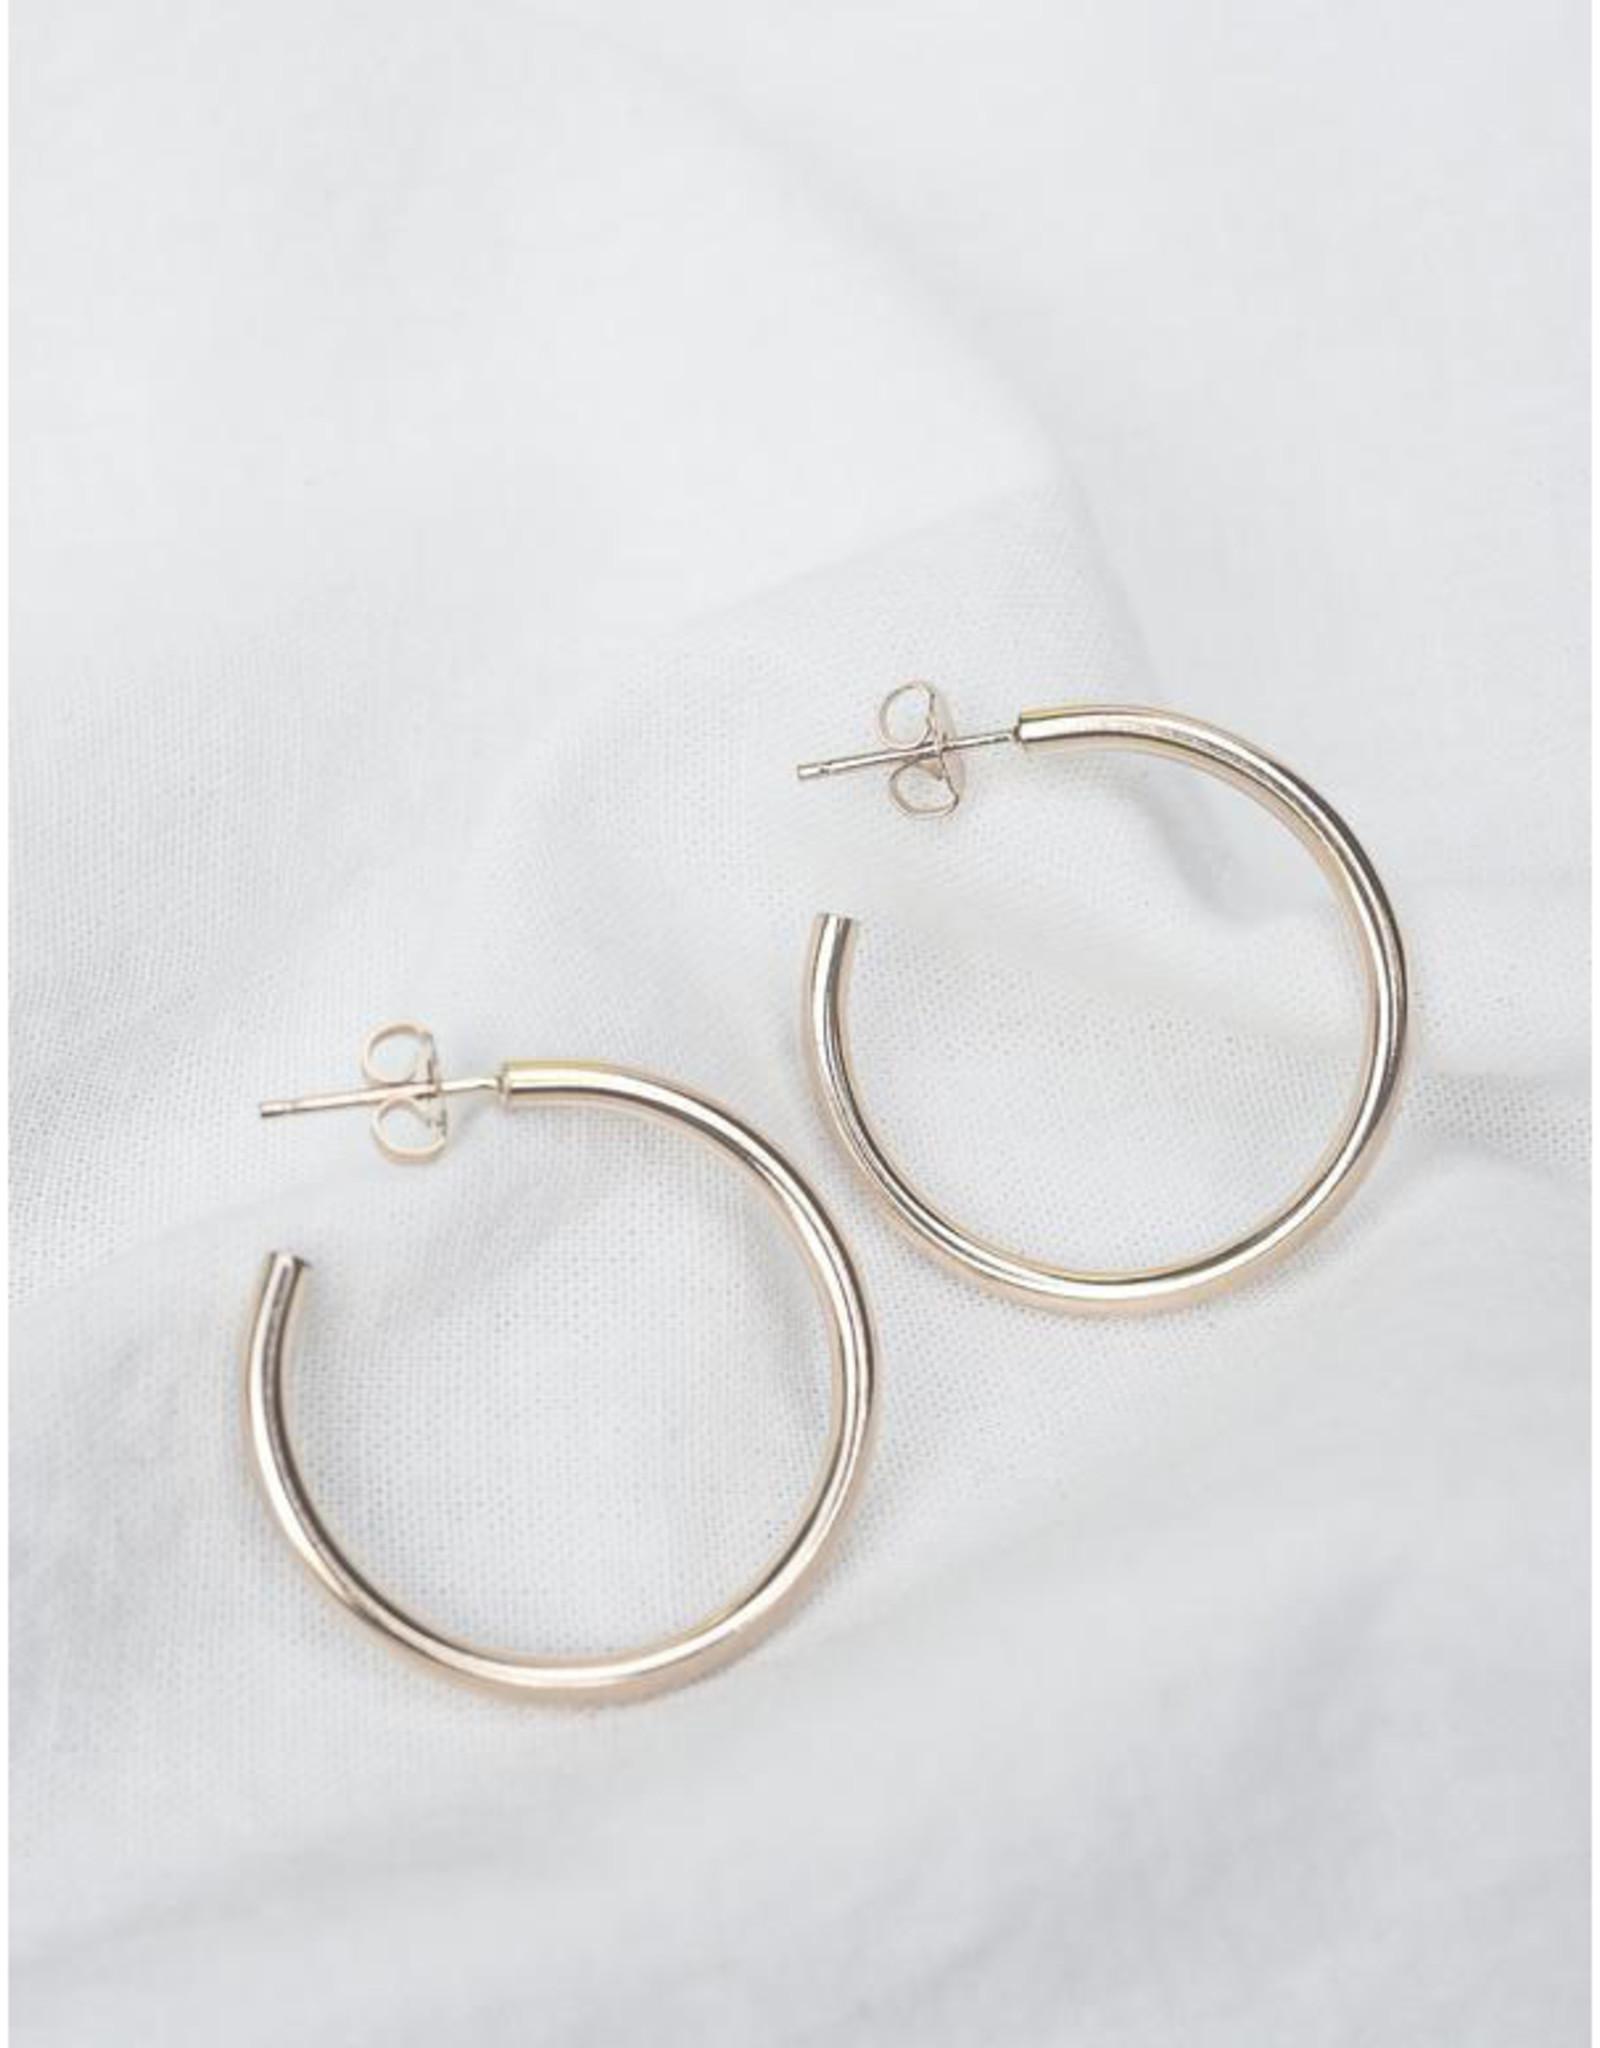 Hart + Stone Lark Hoops - Large - Sterling Silver